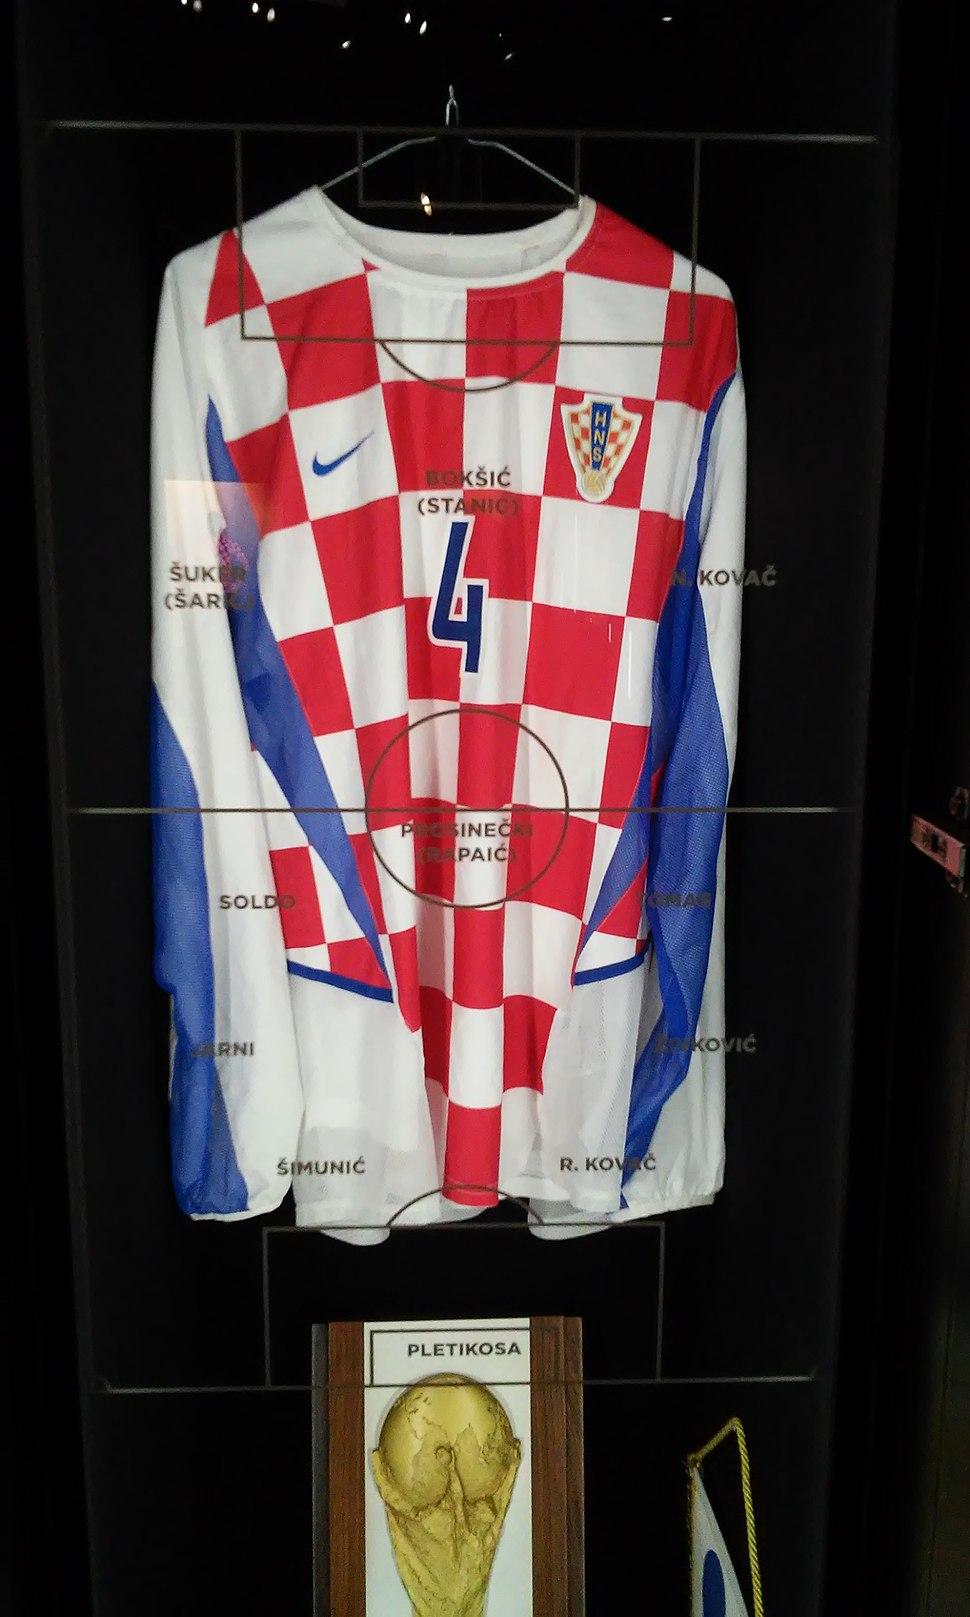 The 2002 Croatia's football home jersey